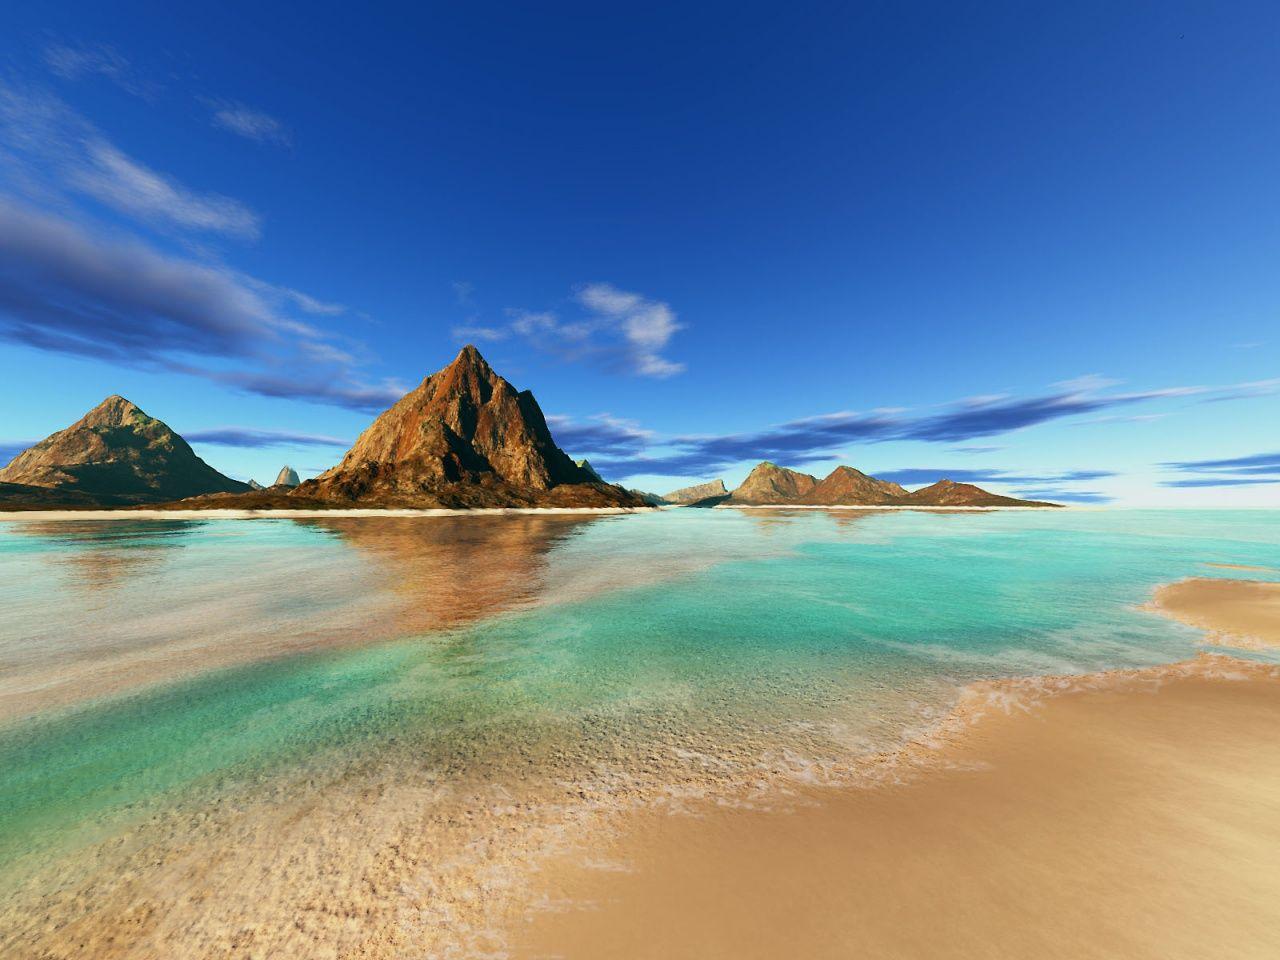 Sandy beach 1280x960 background